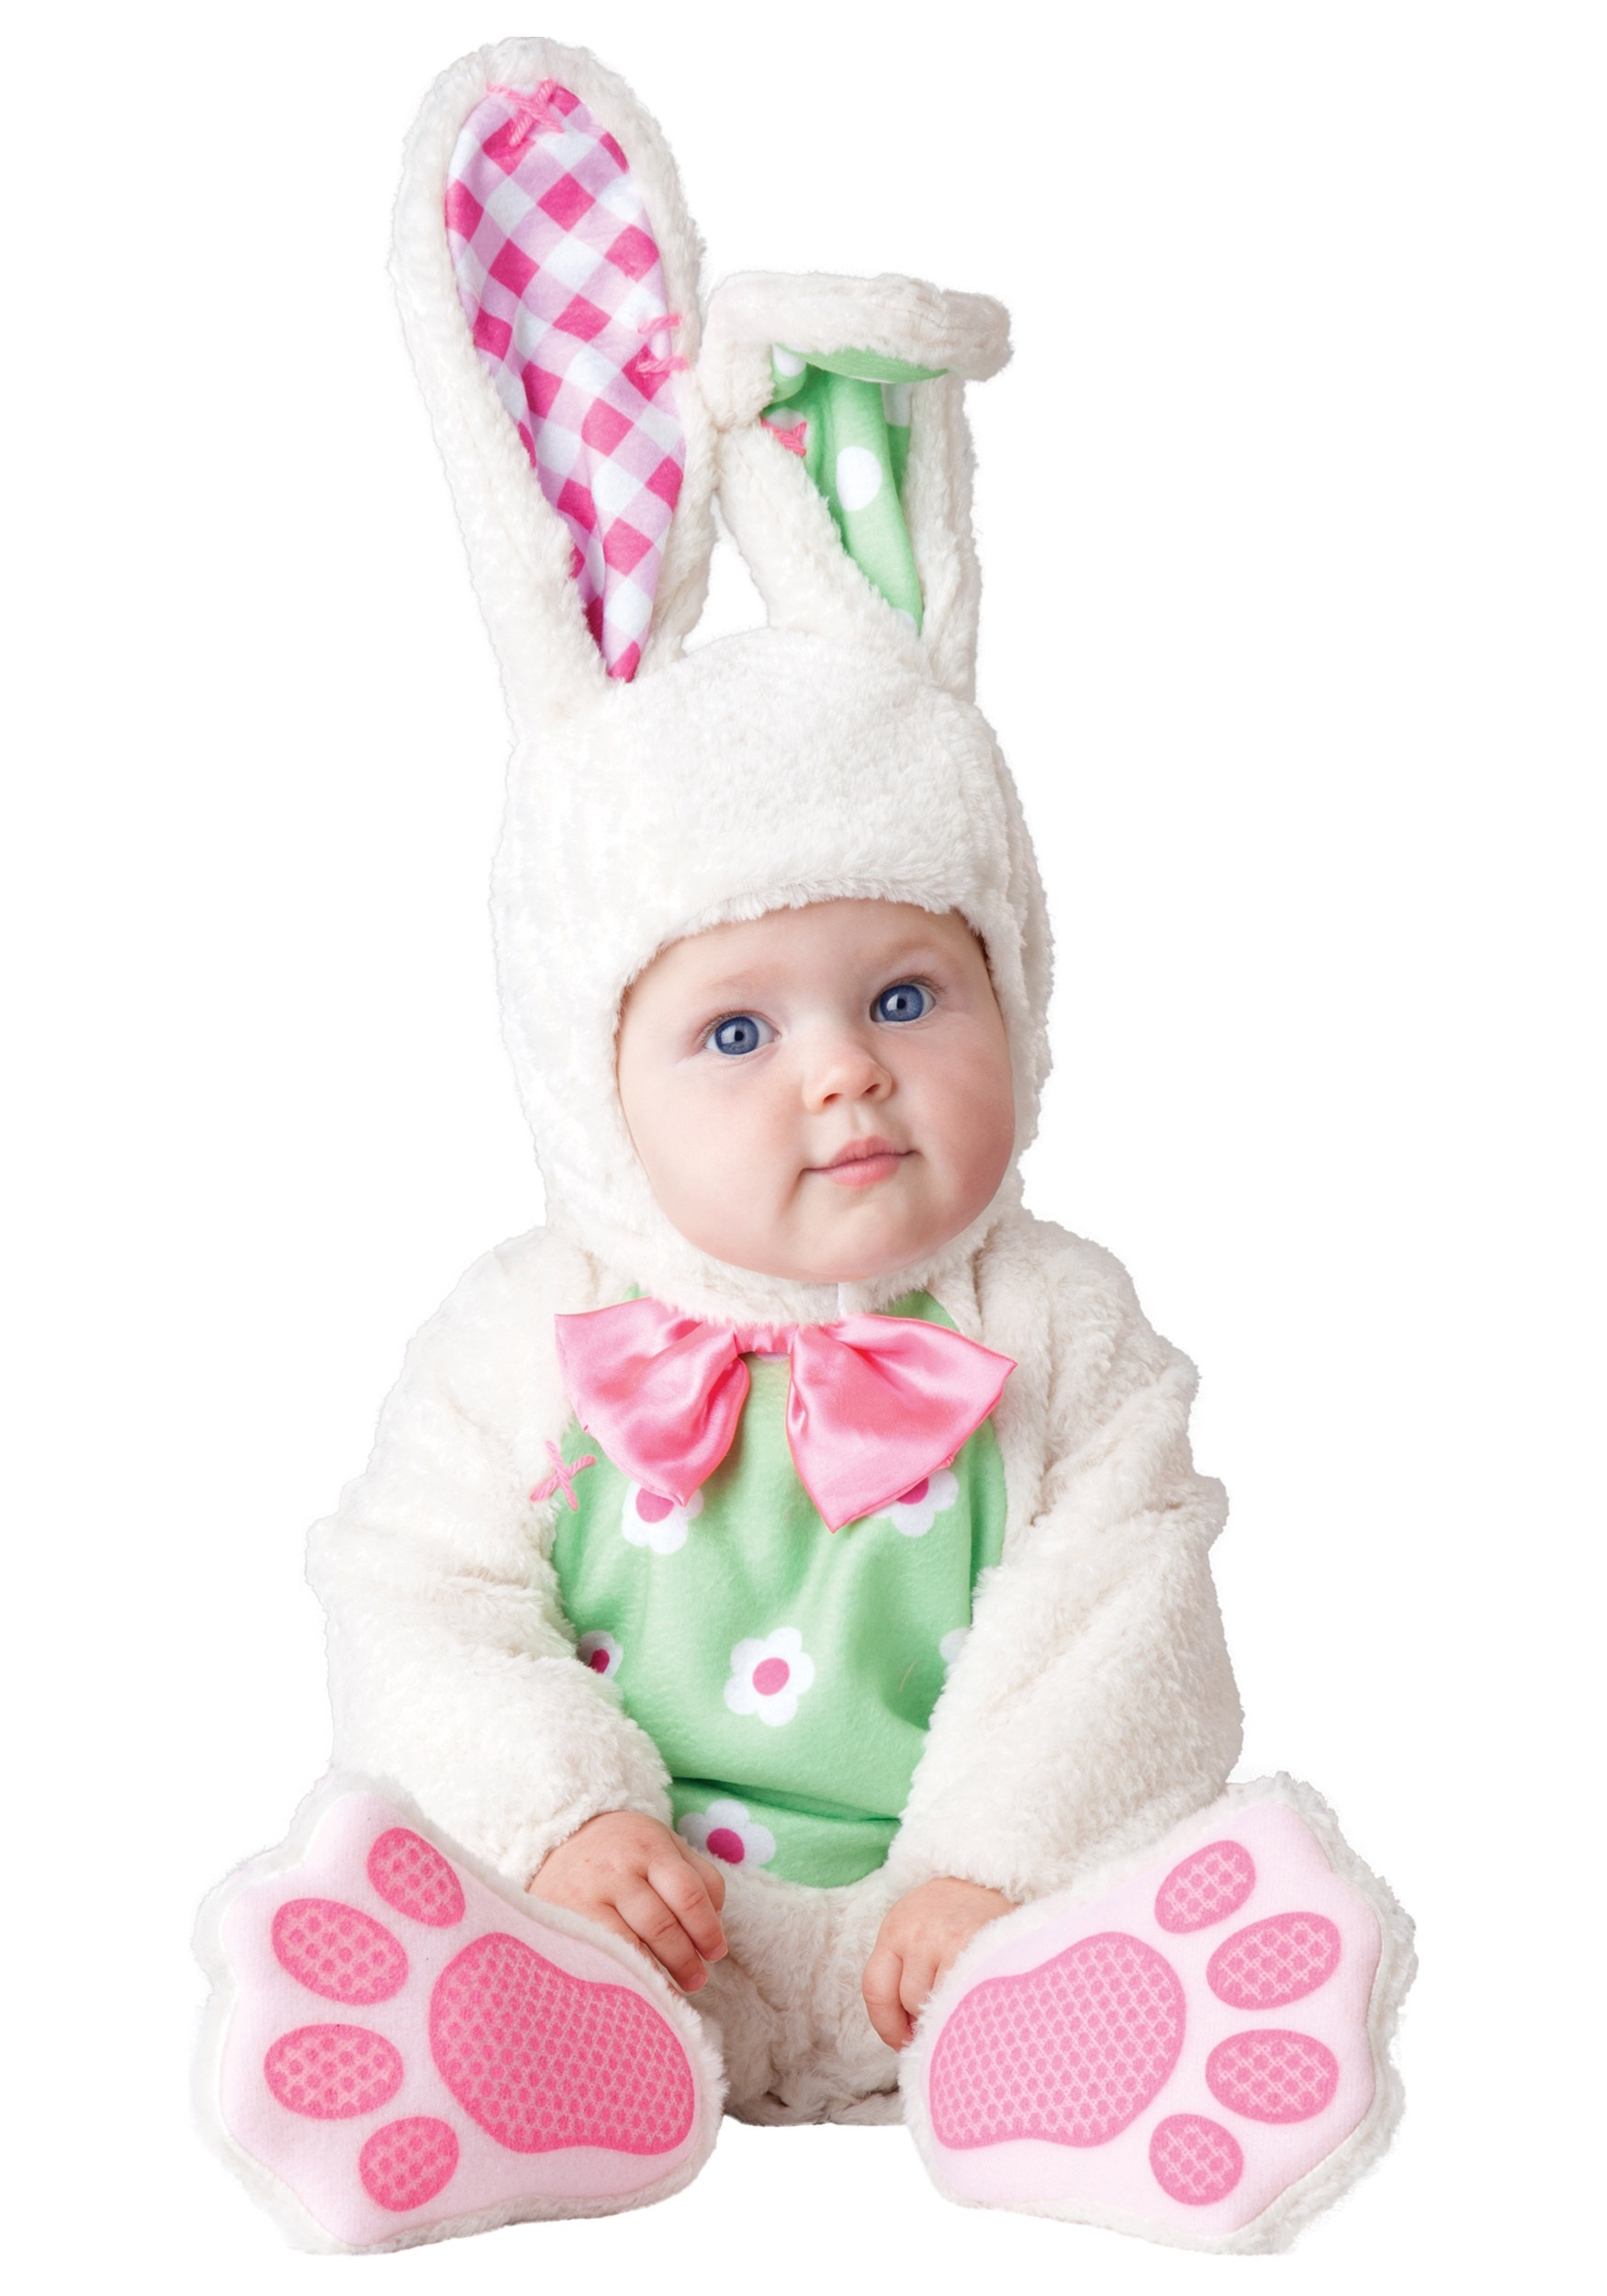 Infant Bunny Costume  sc 1 st  Halloween Costumes & Infant Bunny Costume - Halloween Costumes